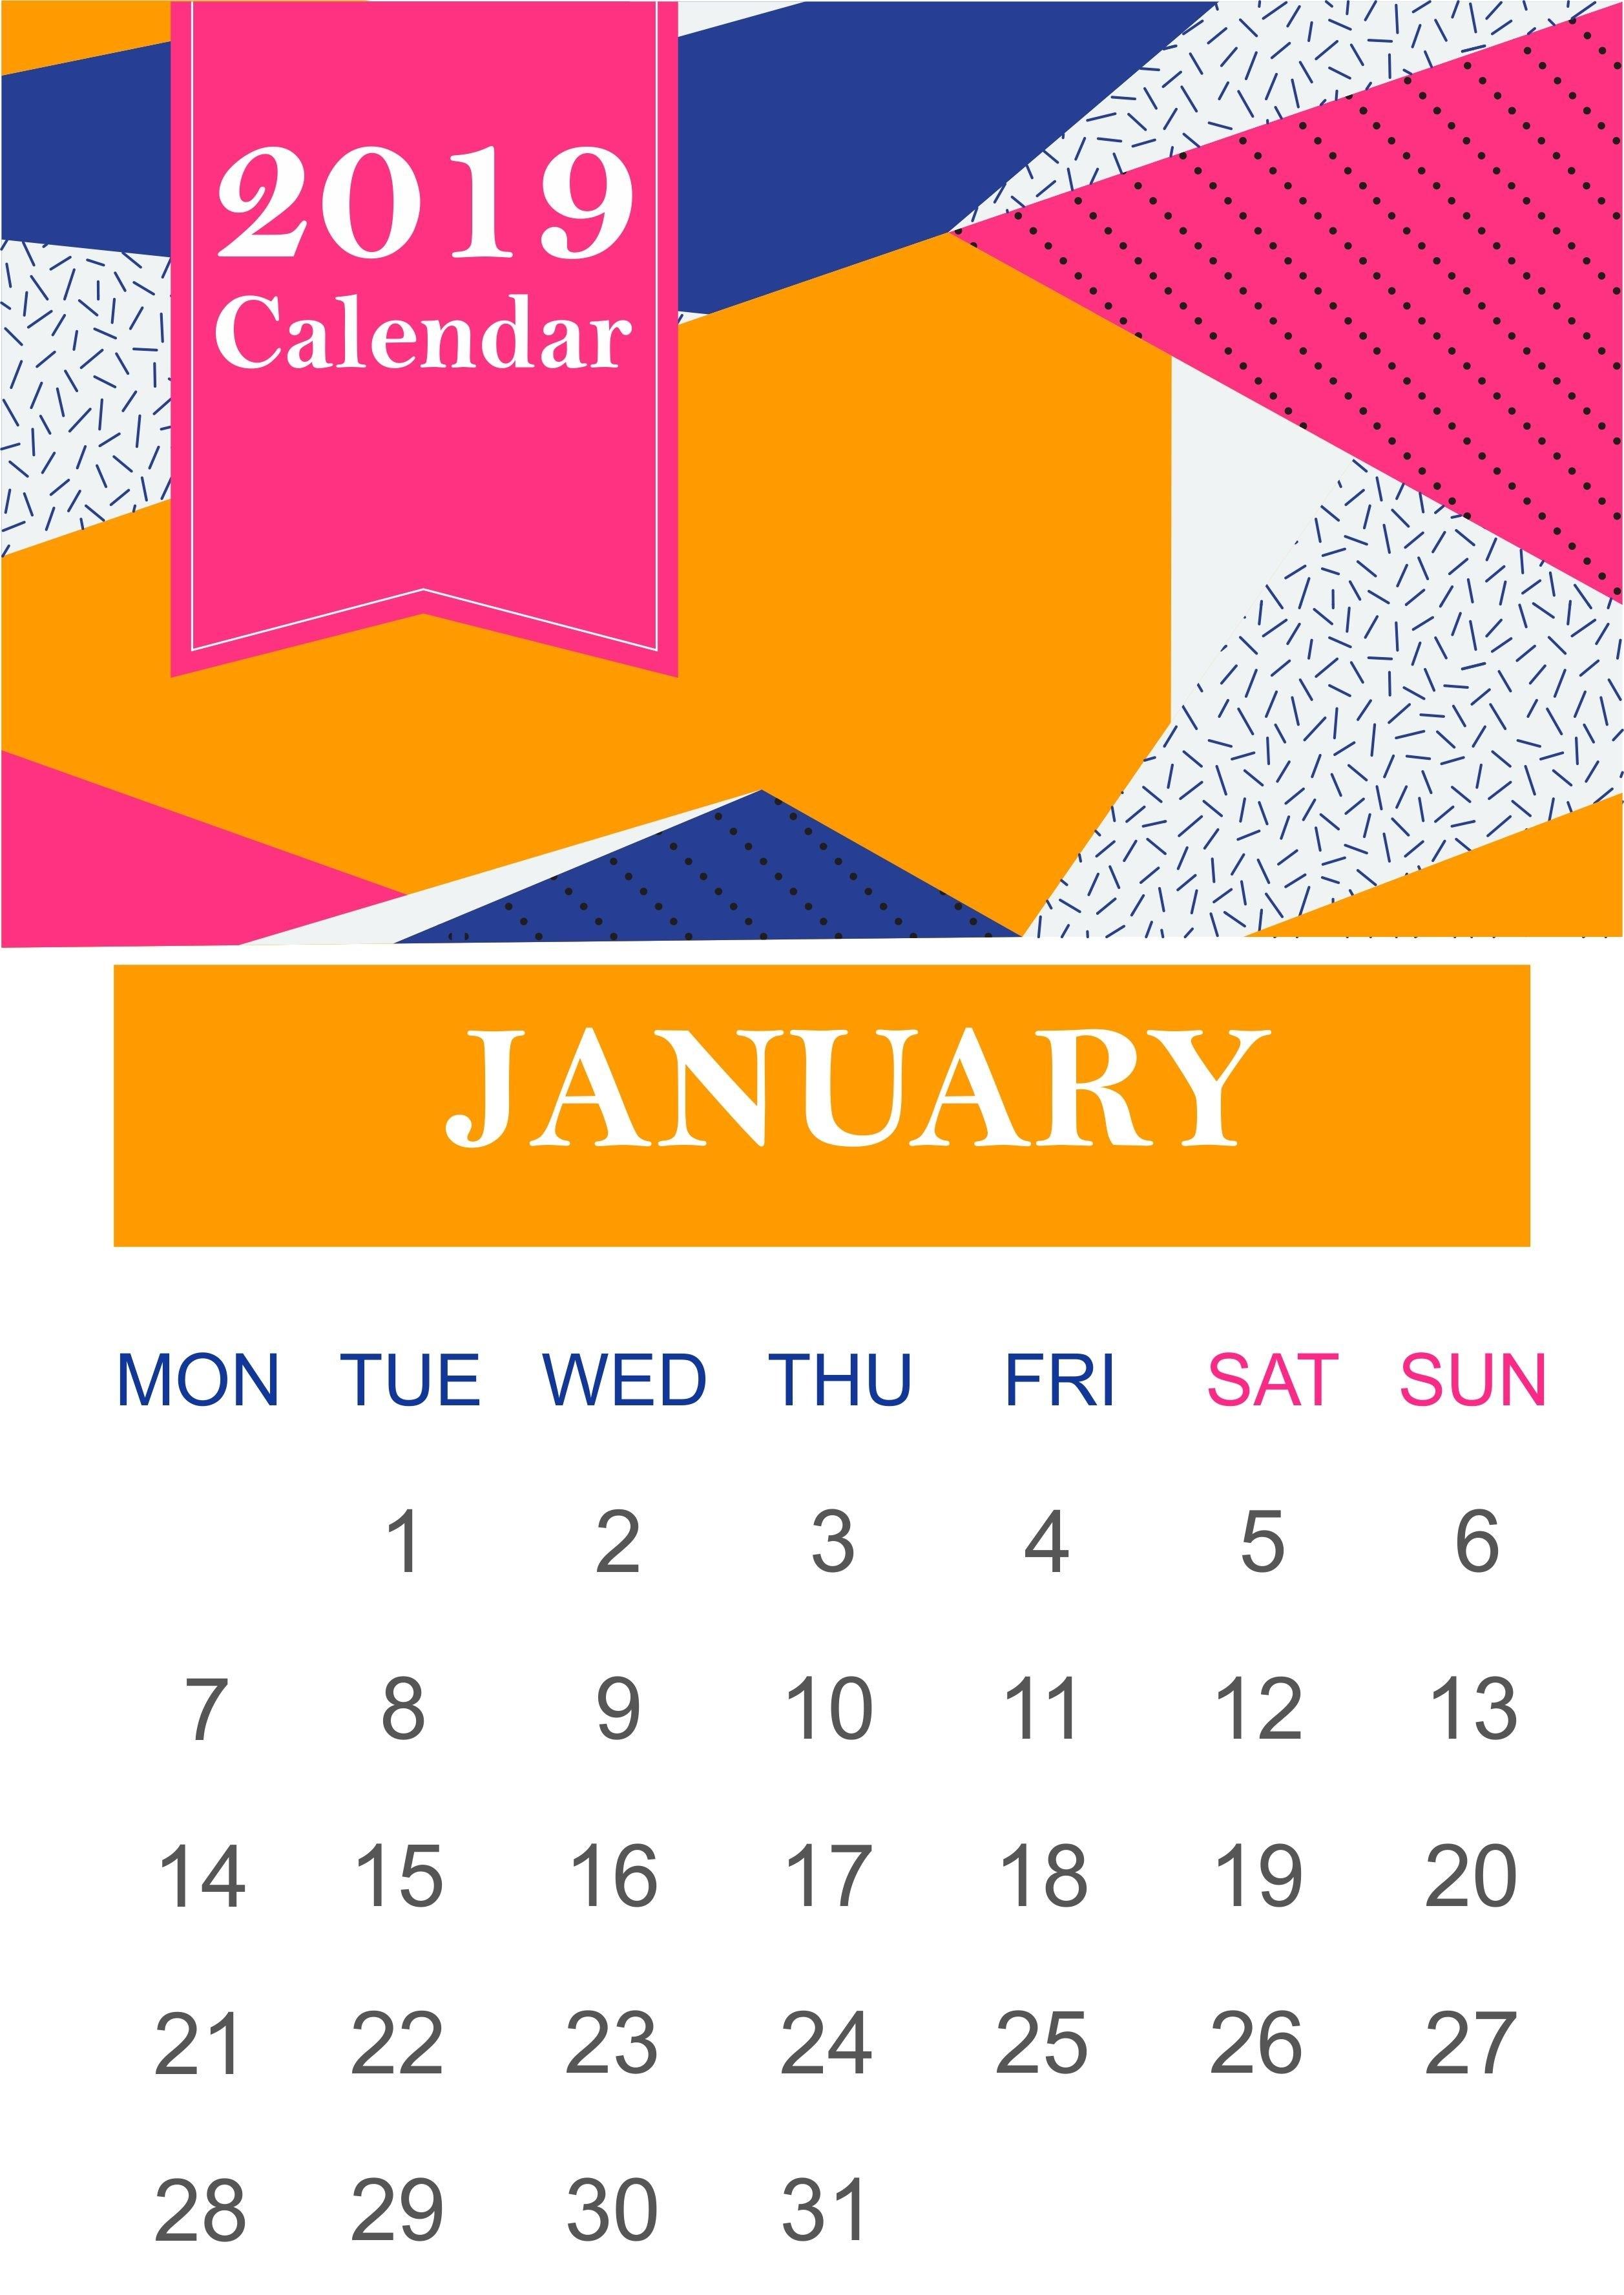 Free Sample Template Of January 2019 Calendar Pdf Excel Wordjanuary January 7 2019 Calendar